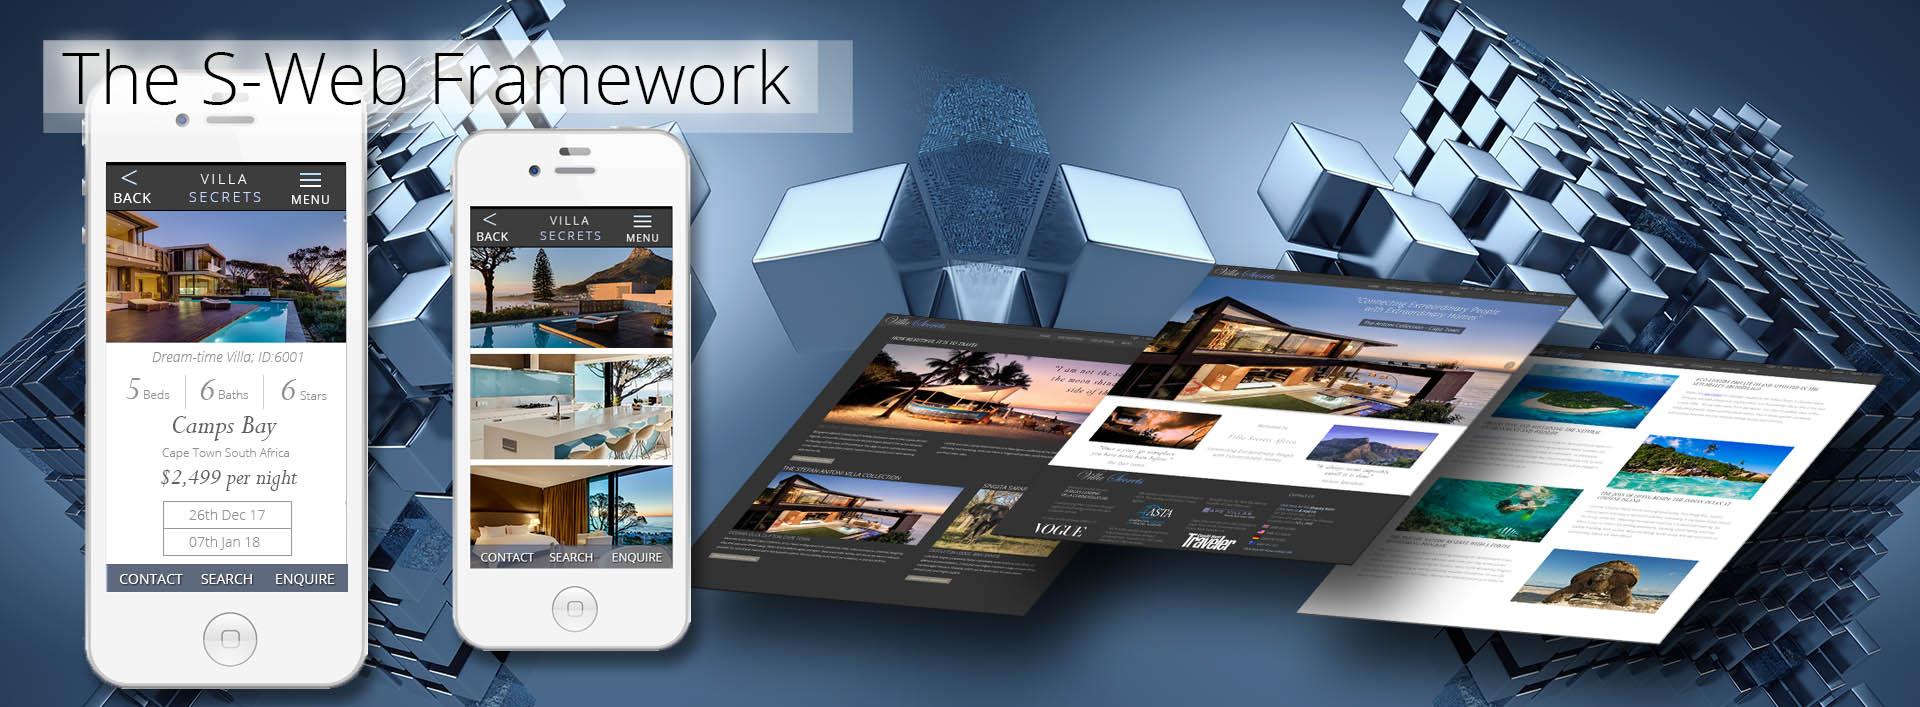 The S-Web Framework